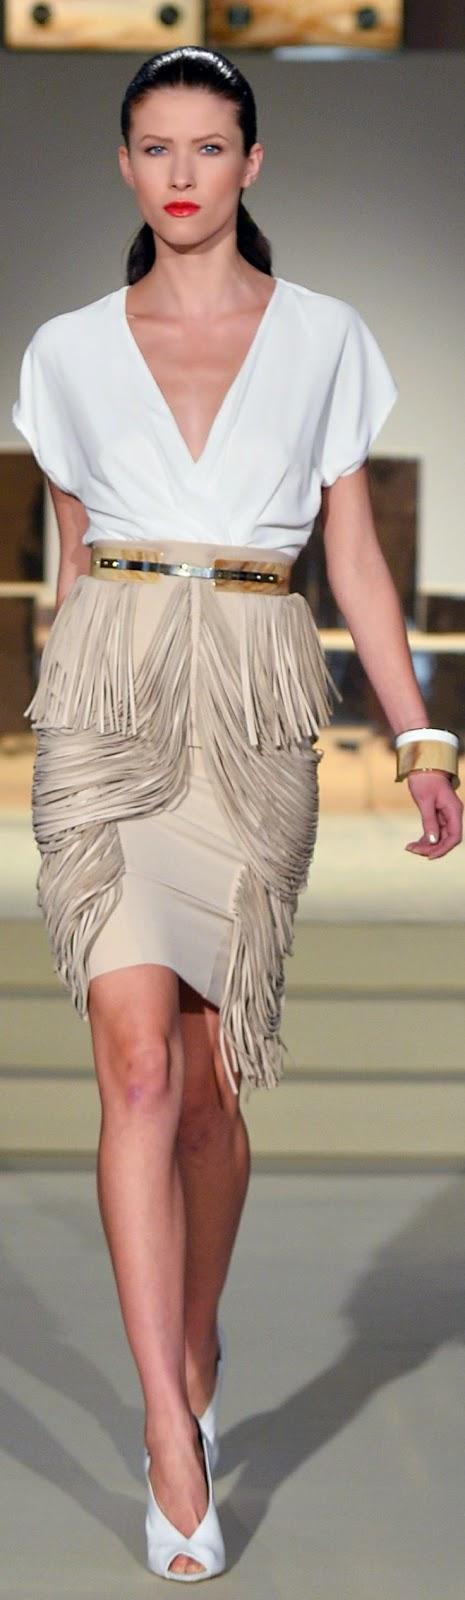 Best Women's Fashion Show. in white bluse &white shuws